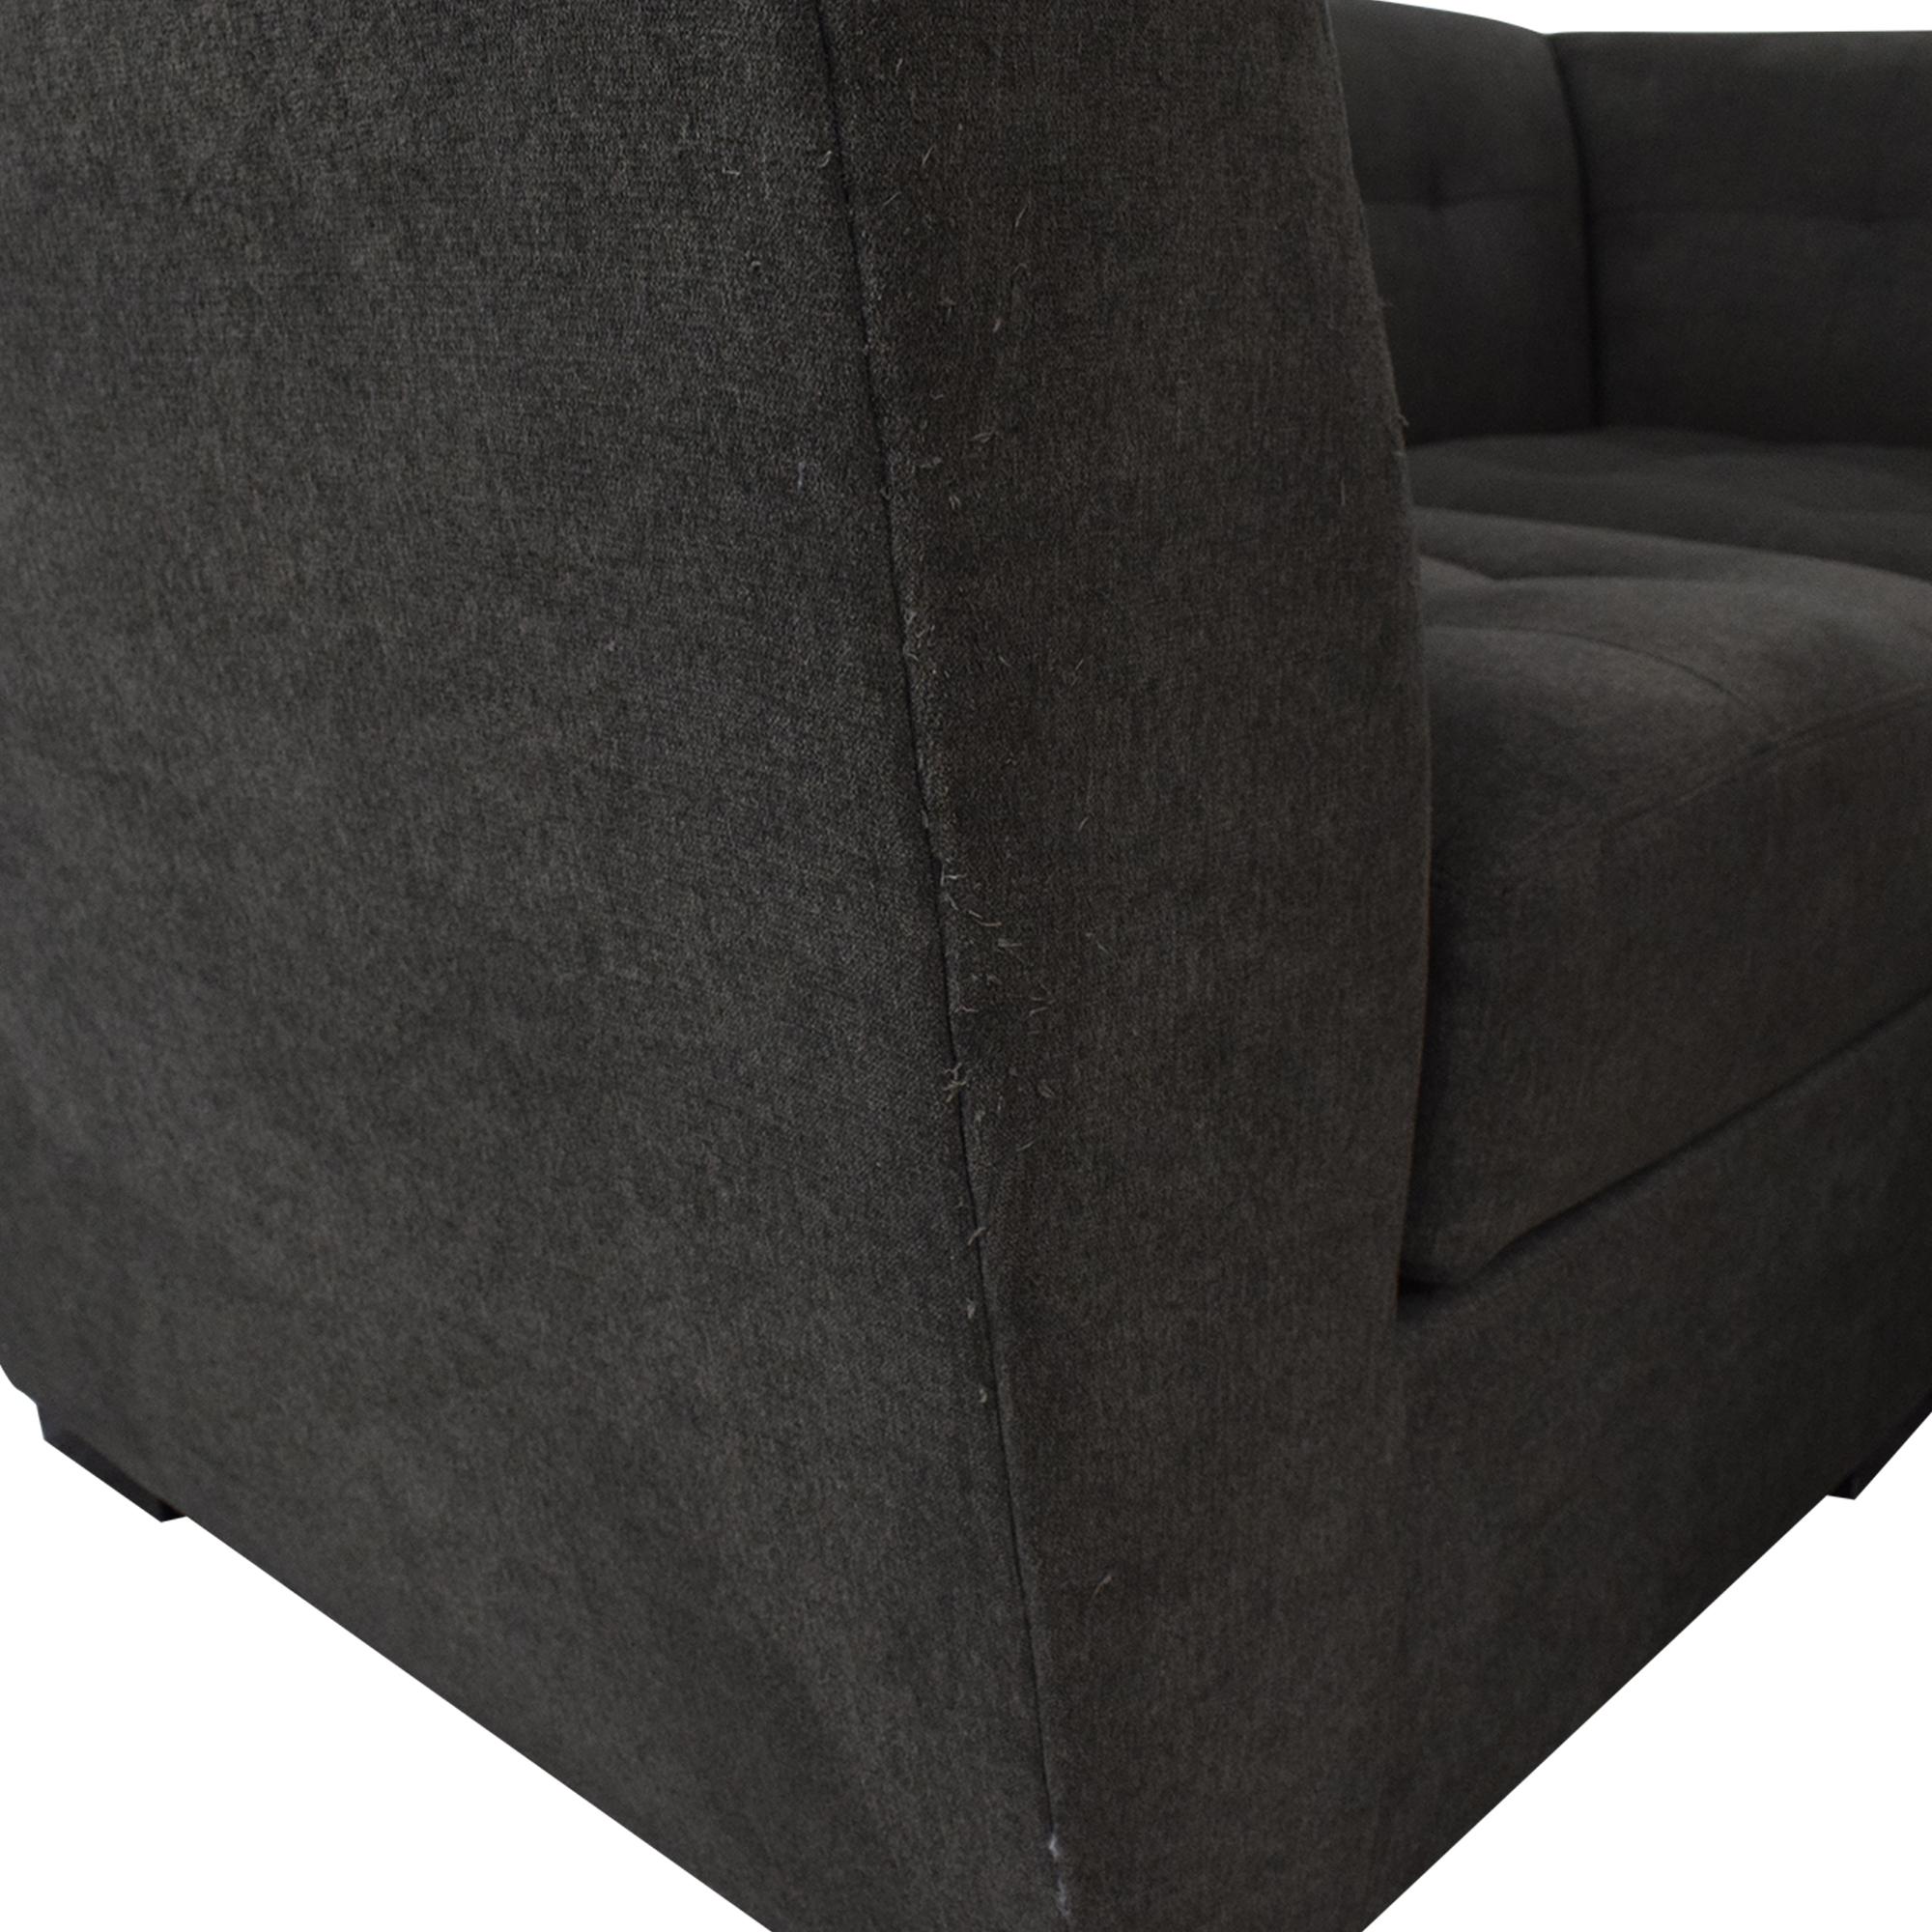 Macy's Macy's Roxanne II Modular Sofa with Bumper Chaise dark grey